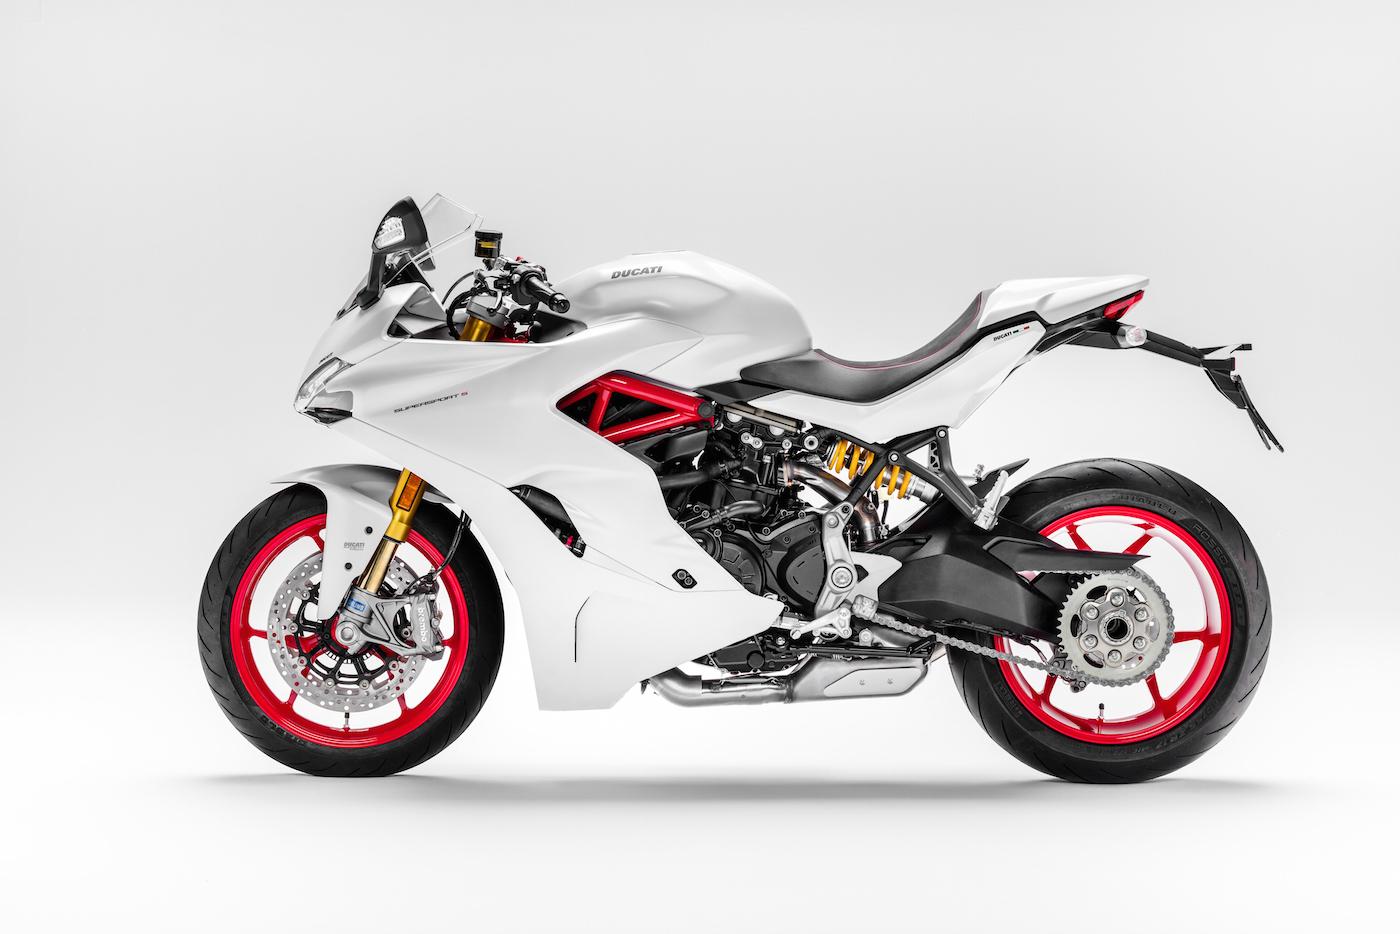 Ducati_Supersport_S_blanche_small3